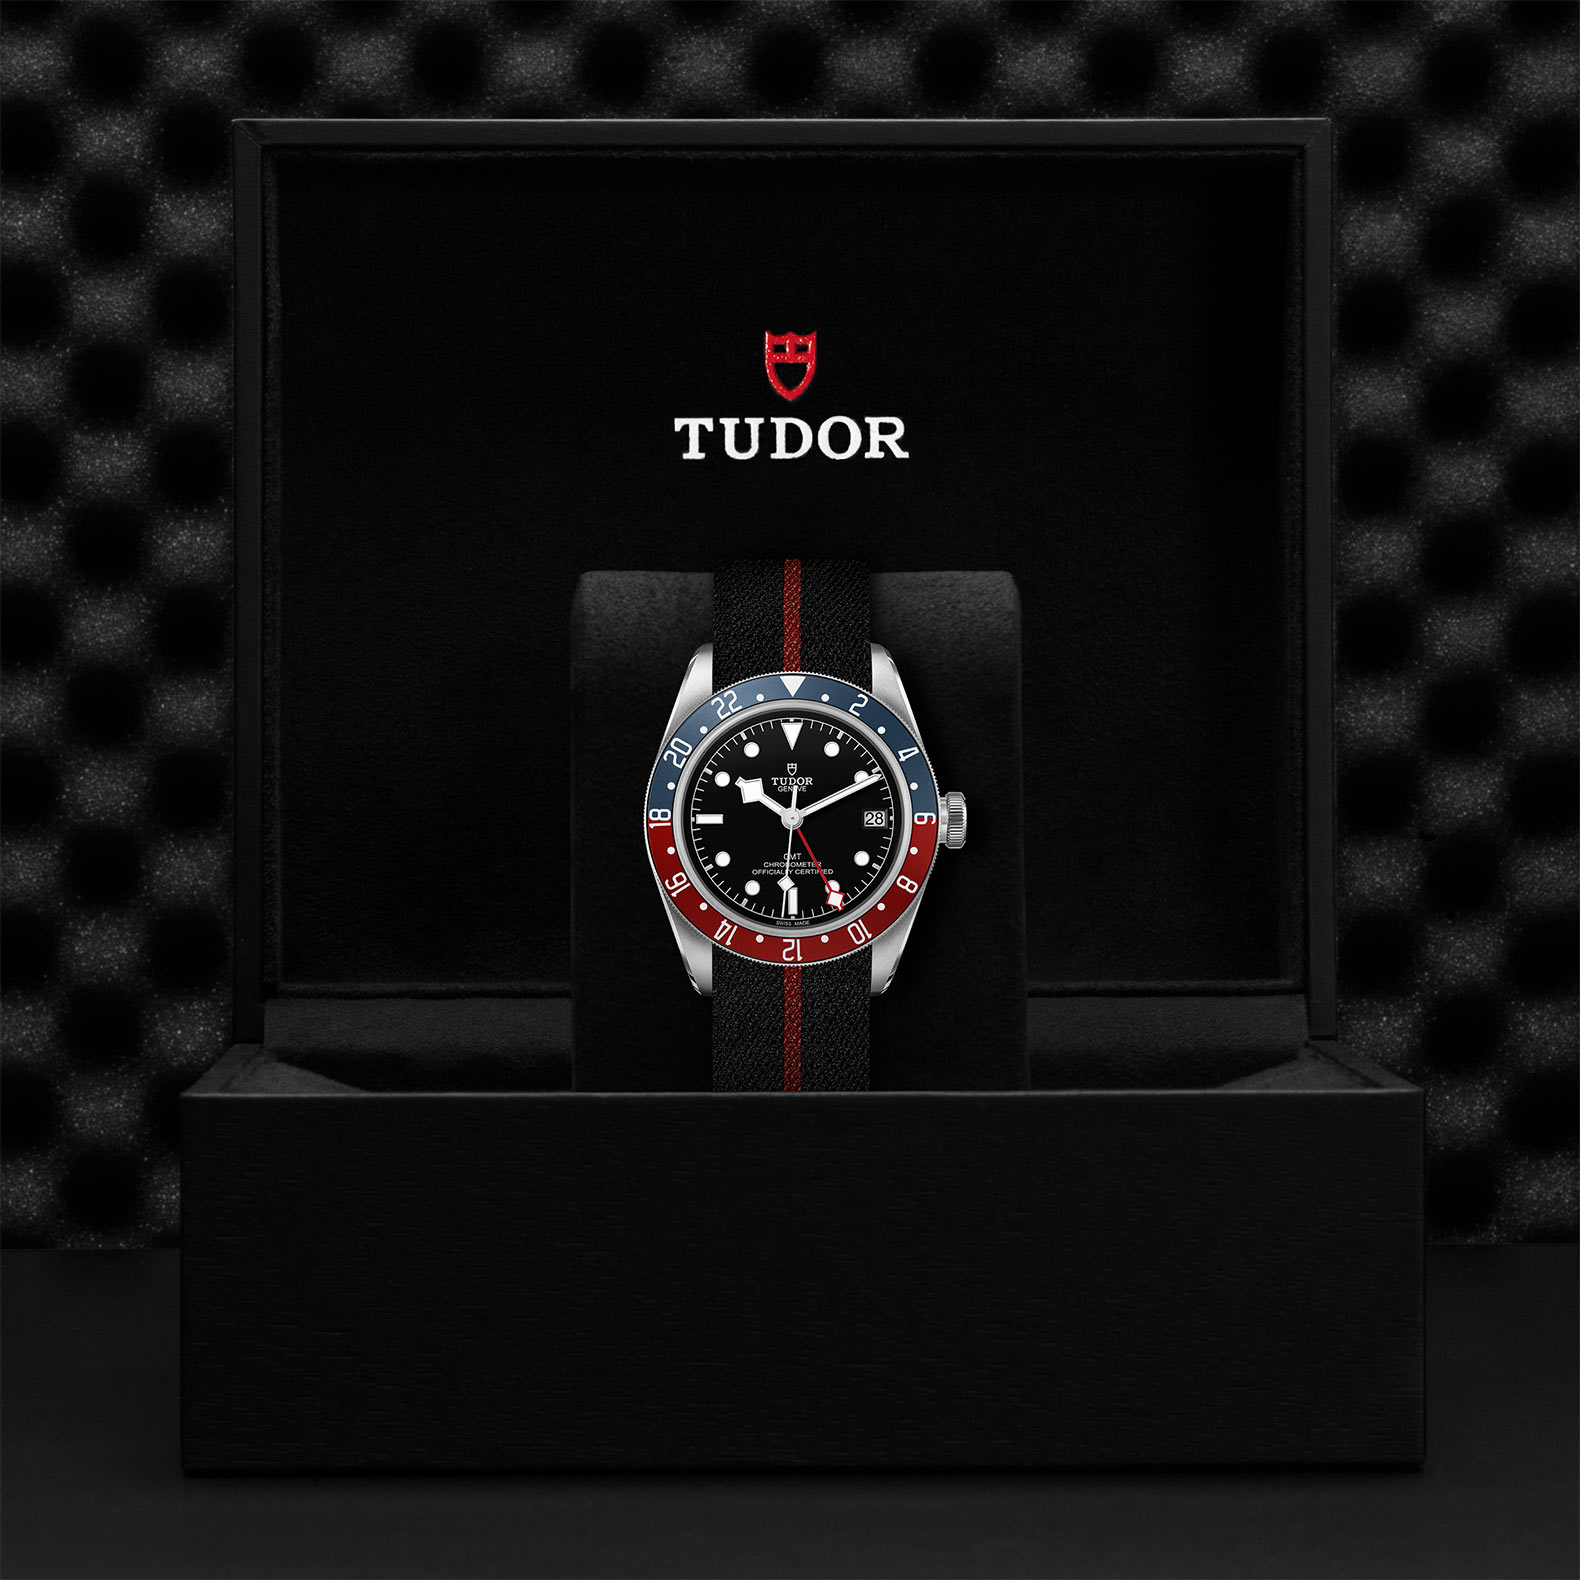 TUDOR Black Bay GMT M79830RB 0003 Presentation